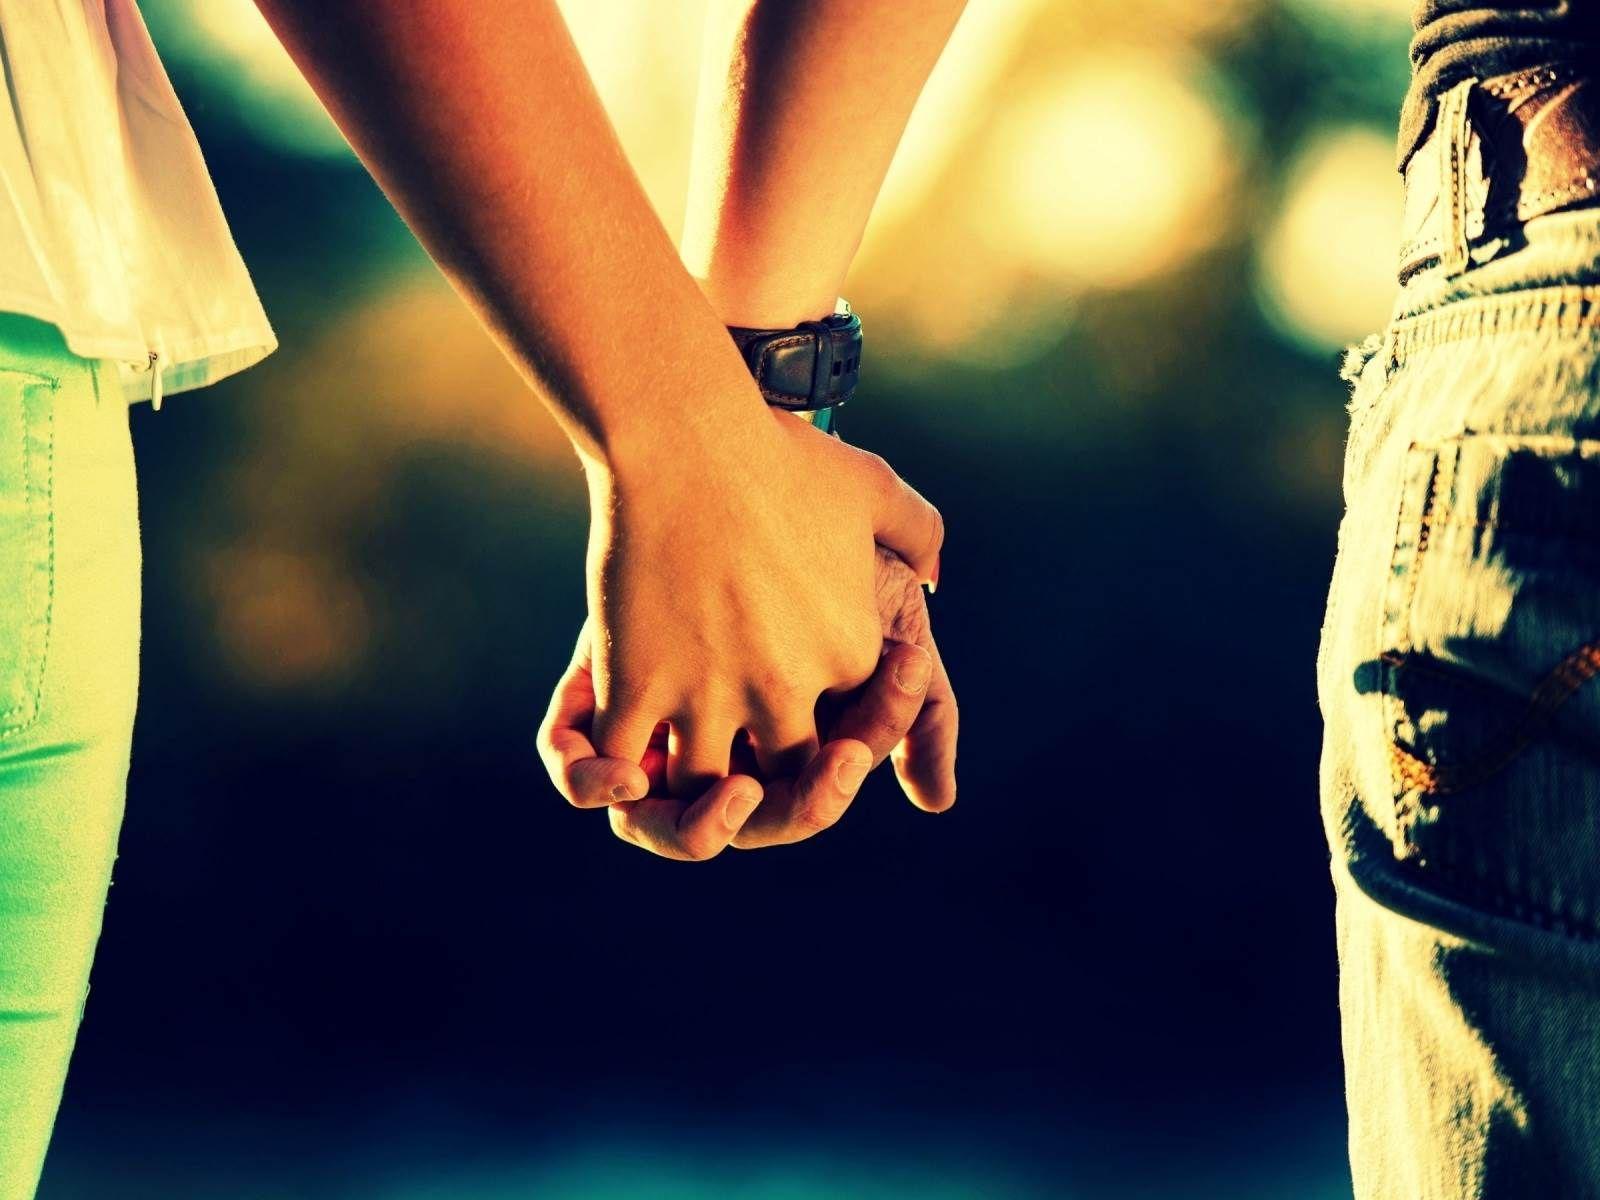 Boy And Girl Love Image 4 whb BoyAndGirlLoveImage BoyAndGirlLove